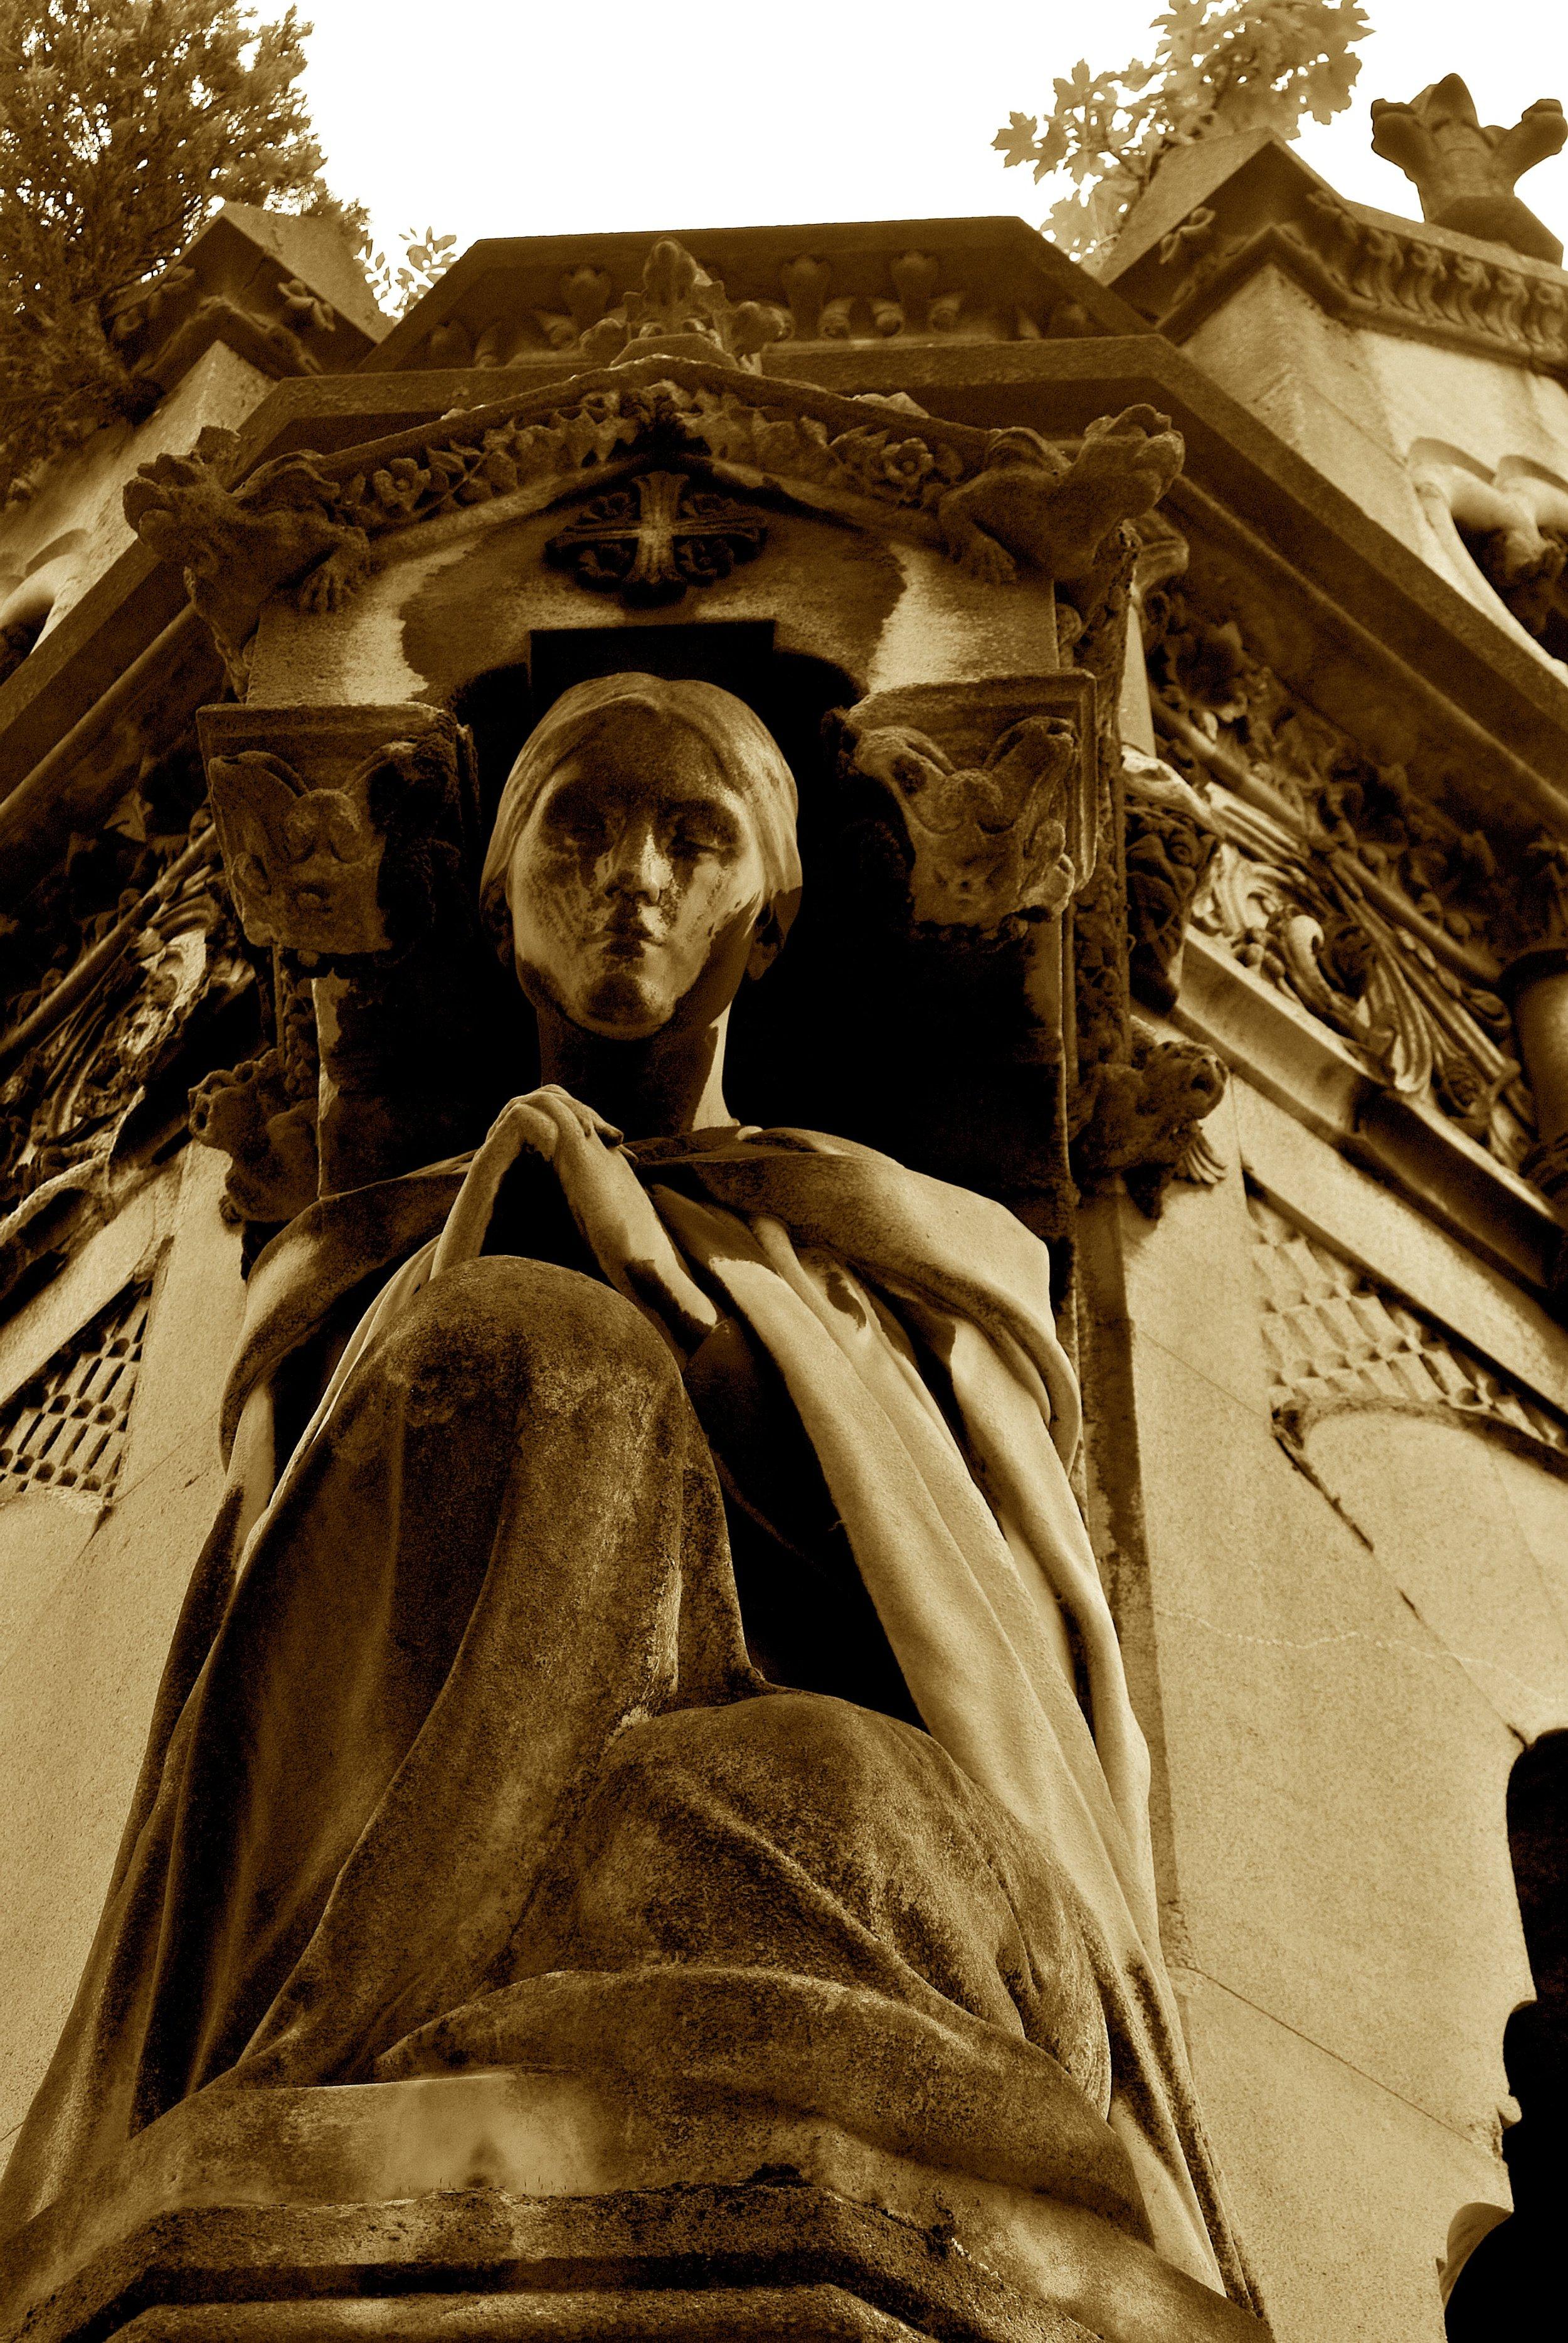 statuarylachaise.JPG